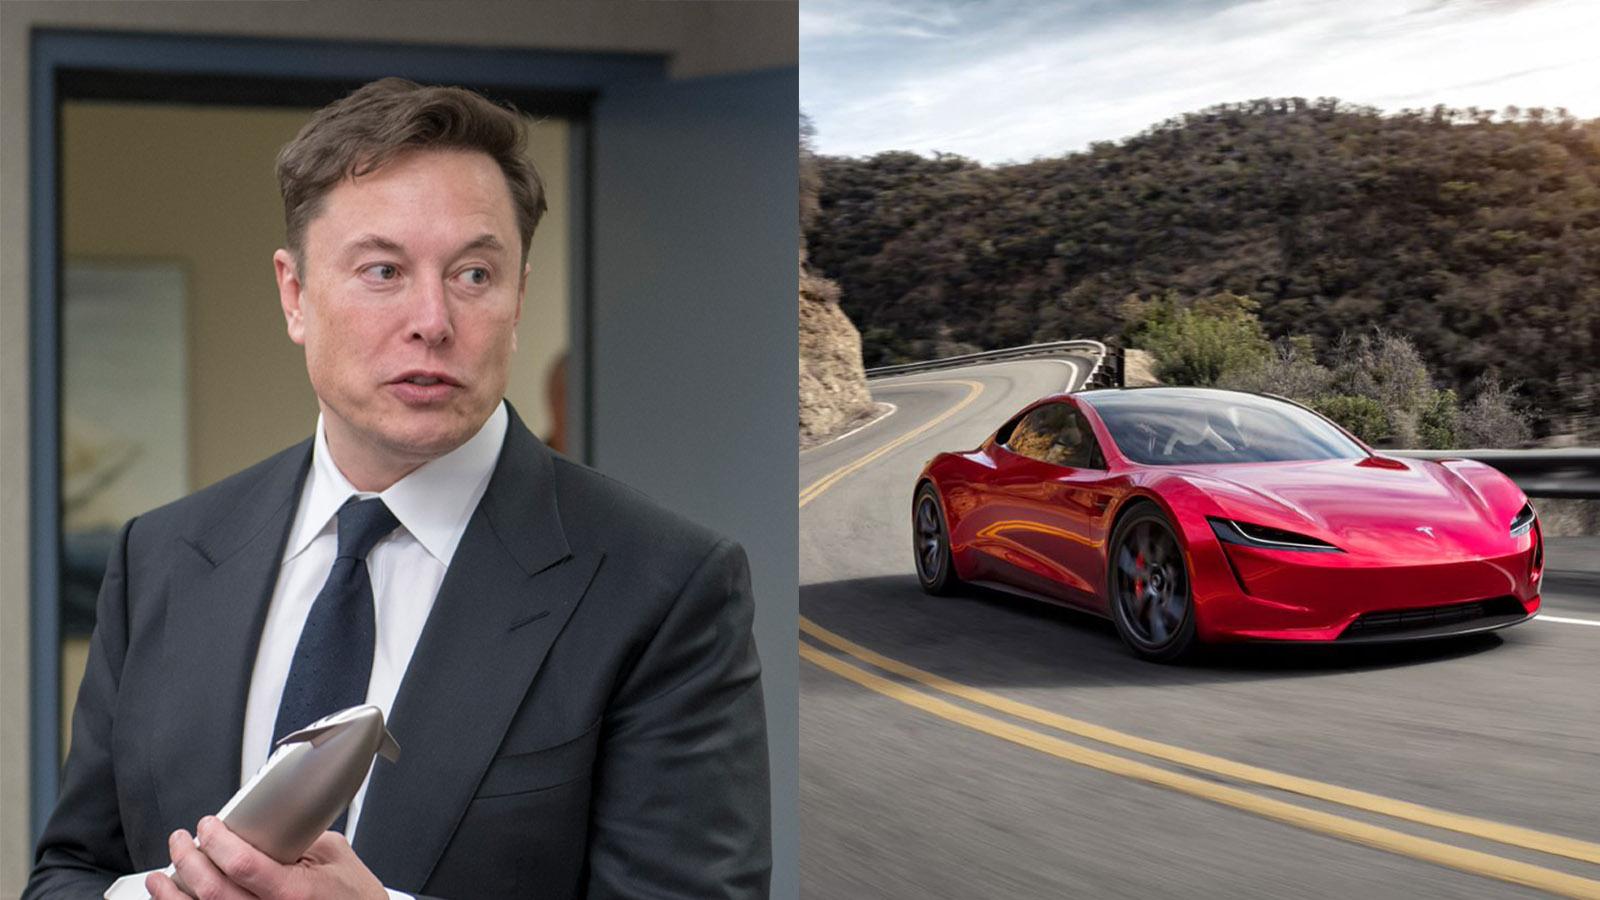 Elon Musk Announces Tesla Roadster on Nurburgring